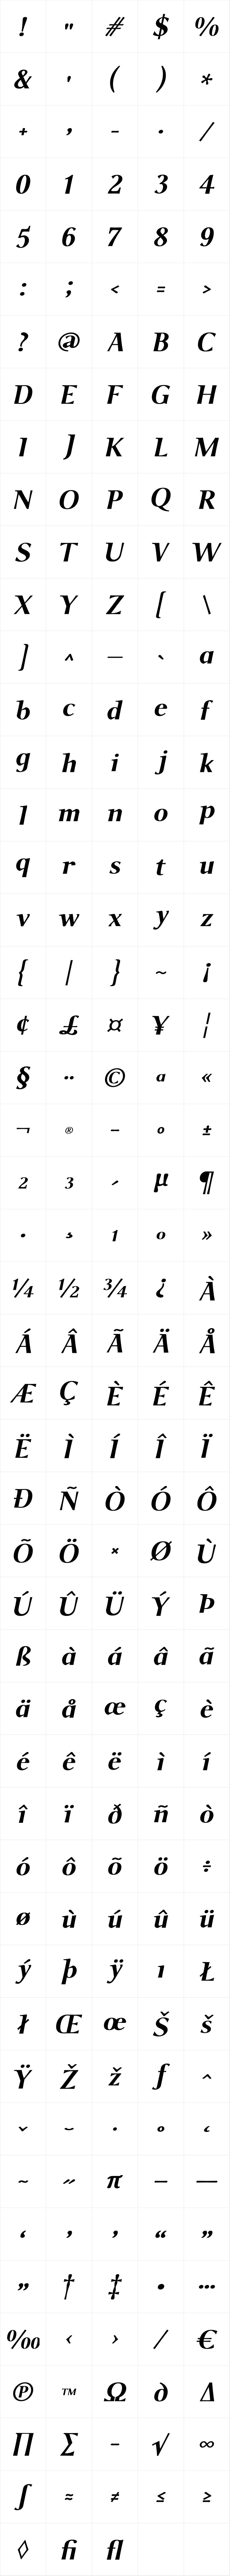 P22 Foxtrot Sans Bold Italic